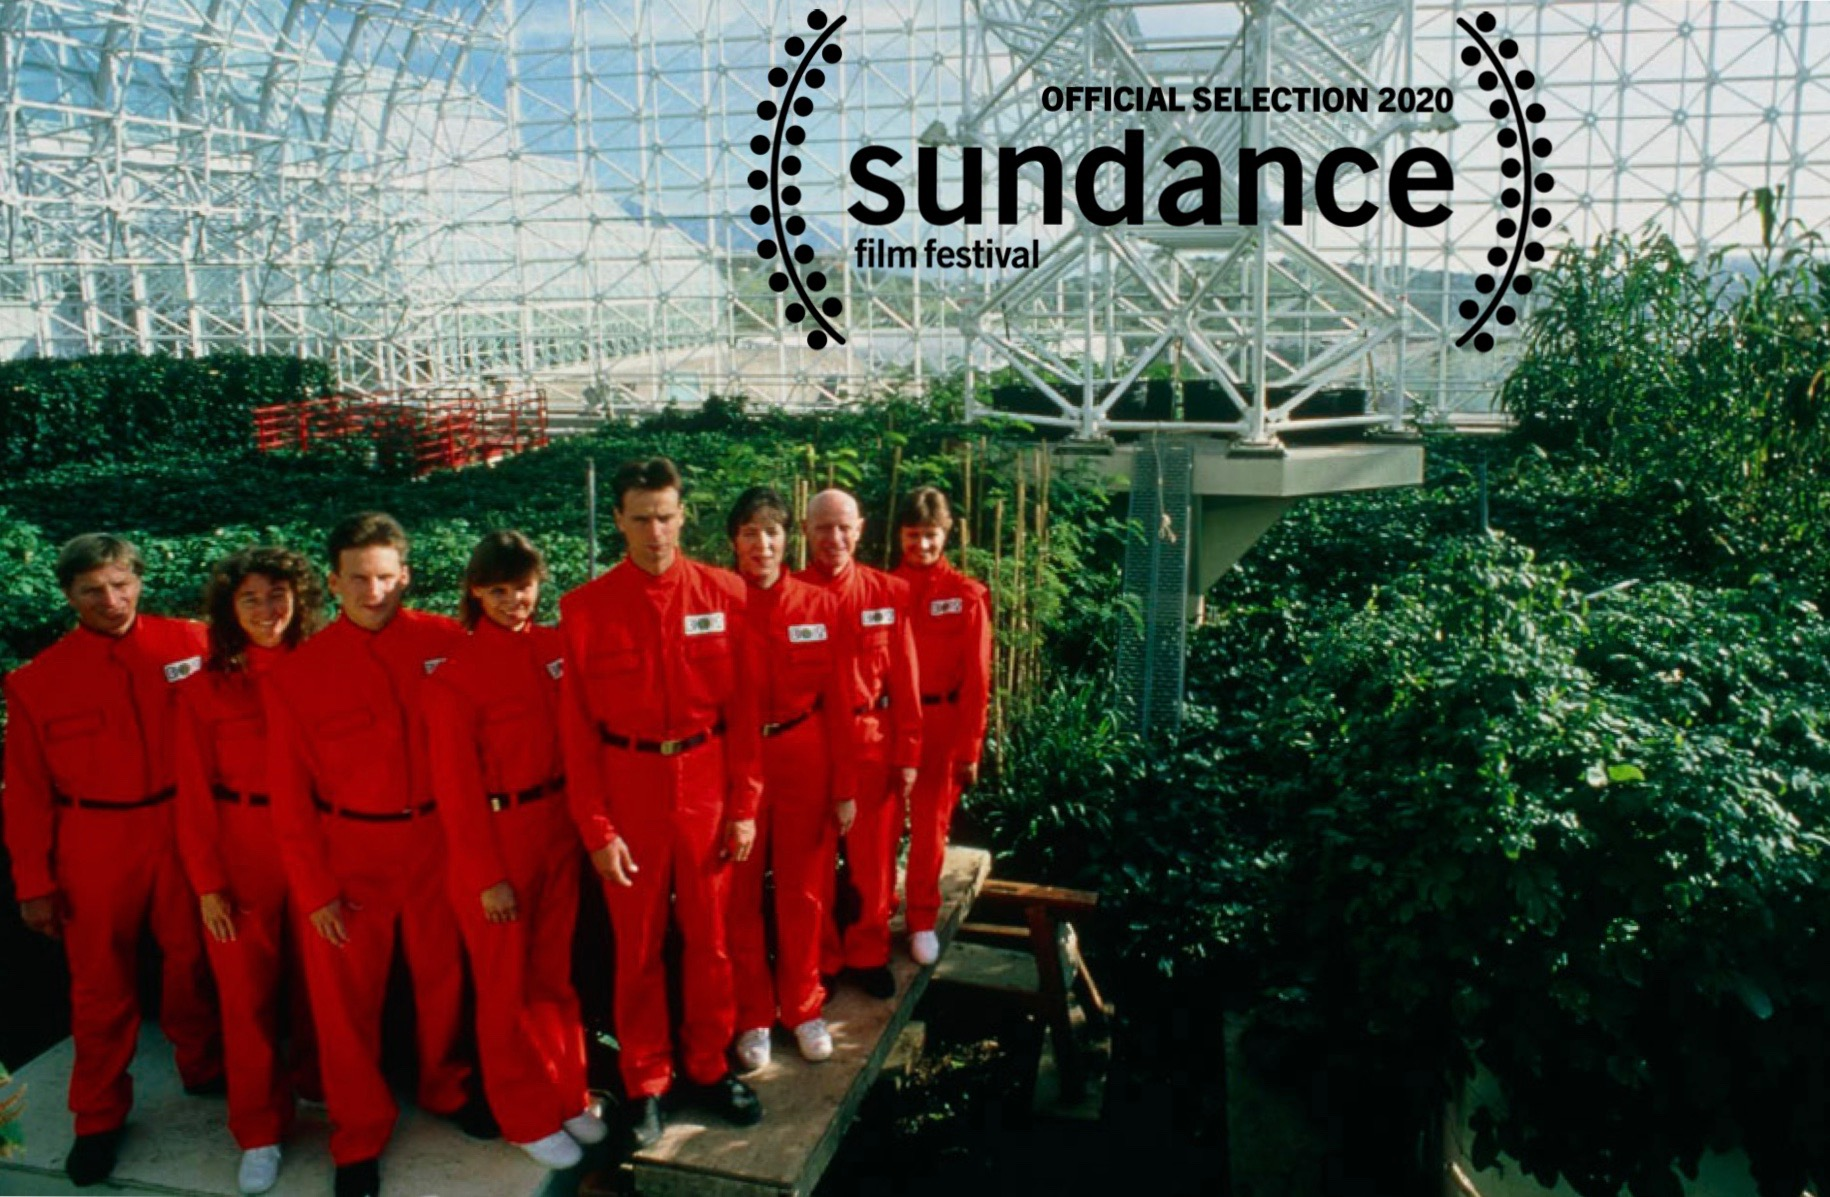 Spaceship Earth Takes Sundance